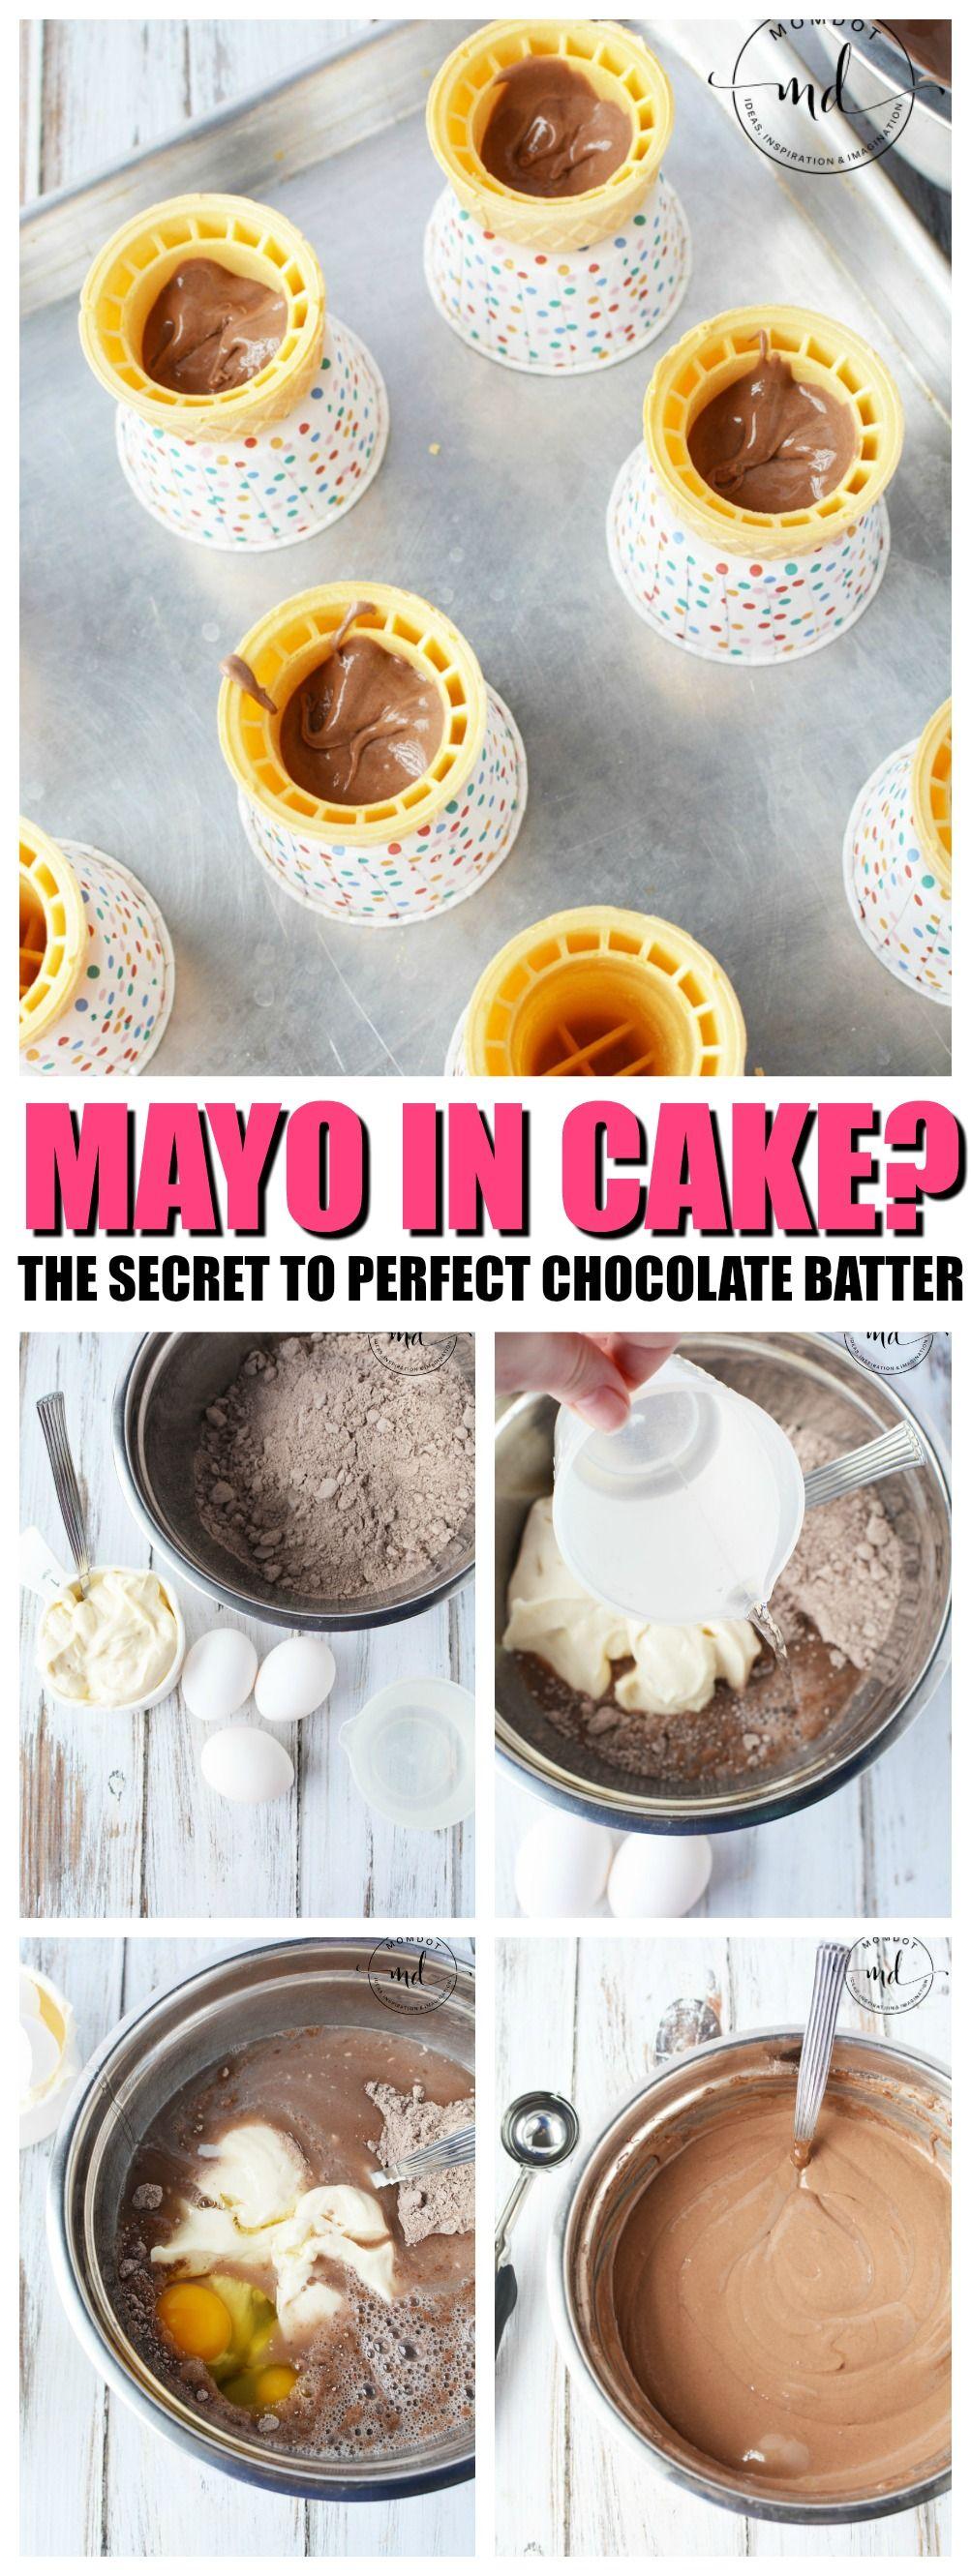 Mayonnaise cake recipe a super moist chocolate cake made